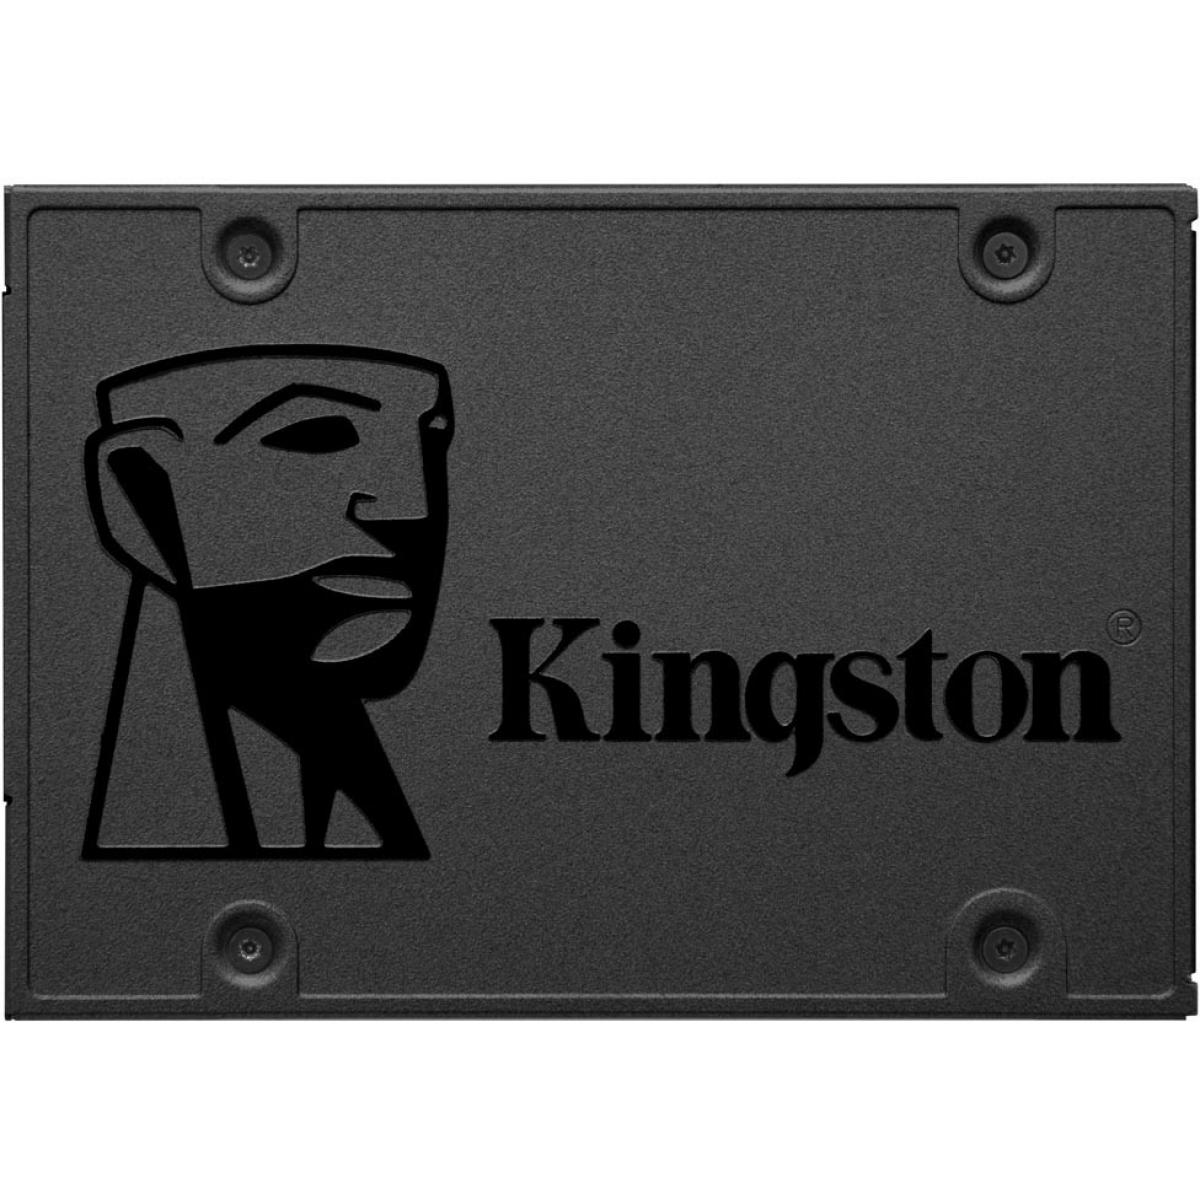 Ssd Kingston 240 Gb A400 Sata 3